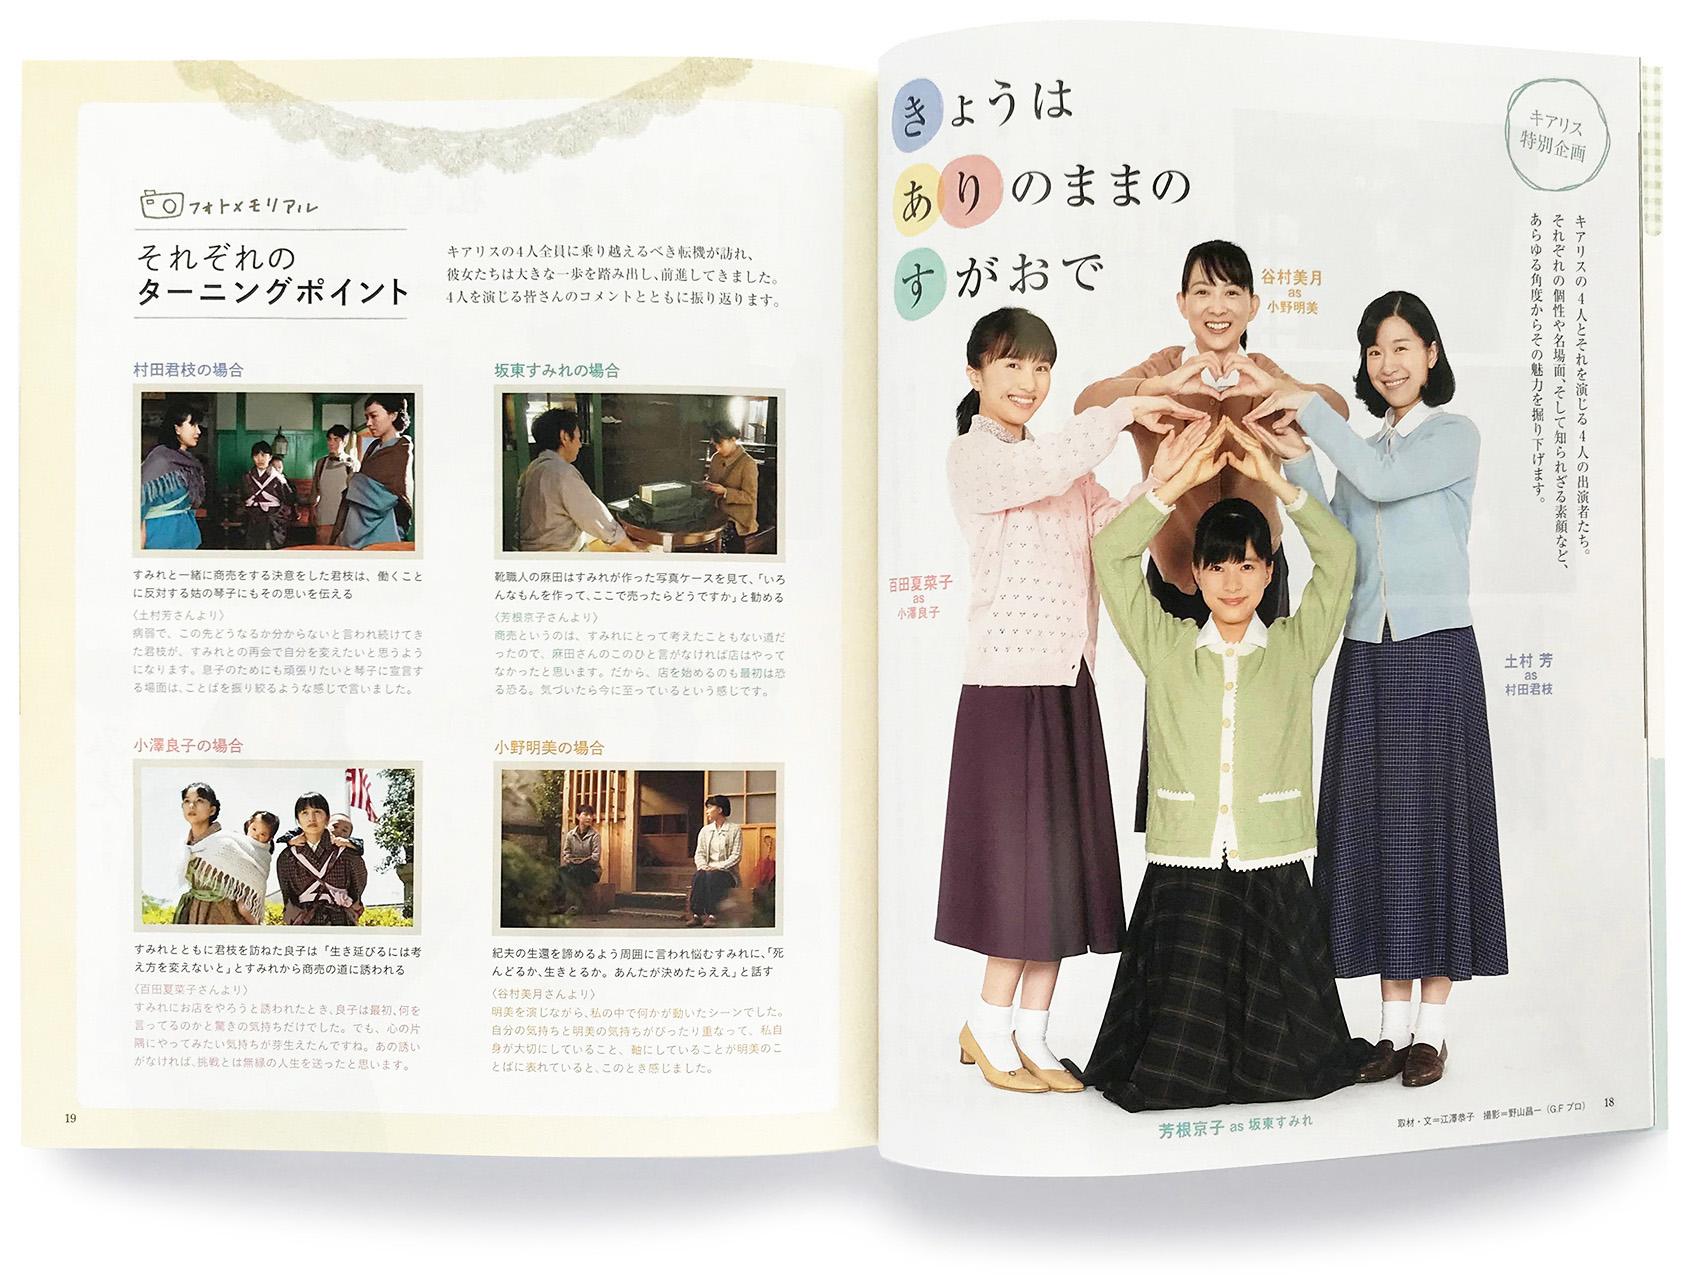 NHKドラマ・ガイド『連続テレビ小説 べっぴんさん』 3